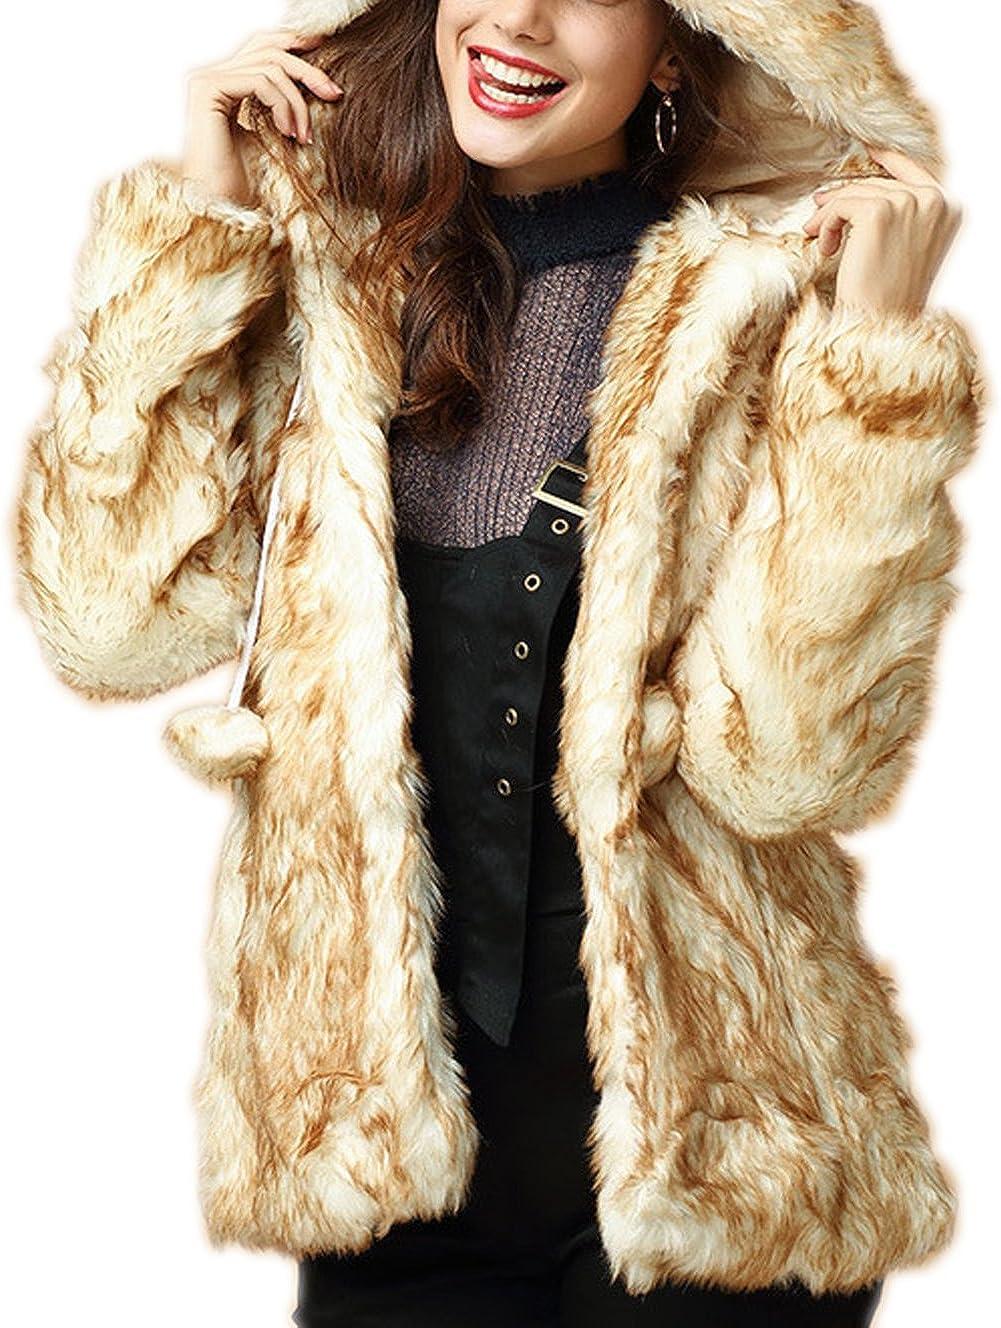 Women's Stylish Hooded Thick Faux Fur Outerwear Parka Long Sleeve Warm Coat